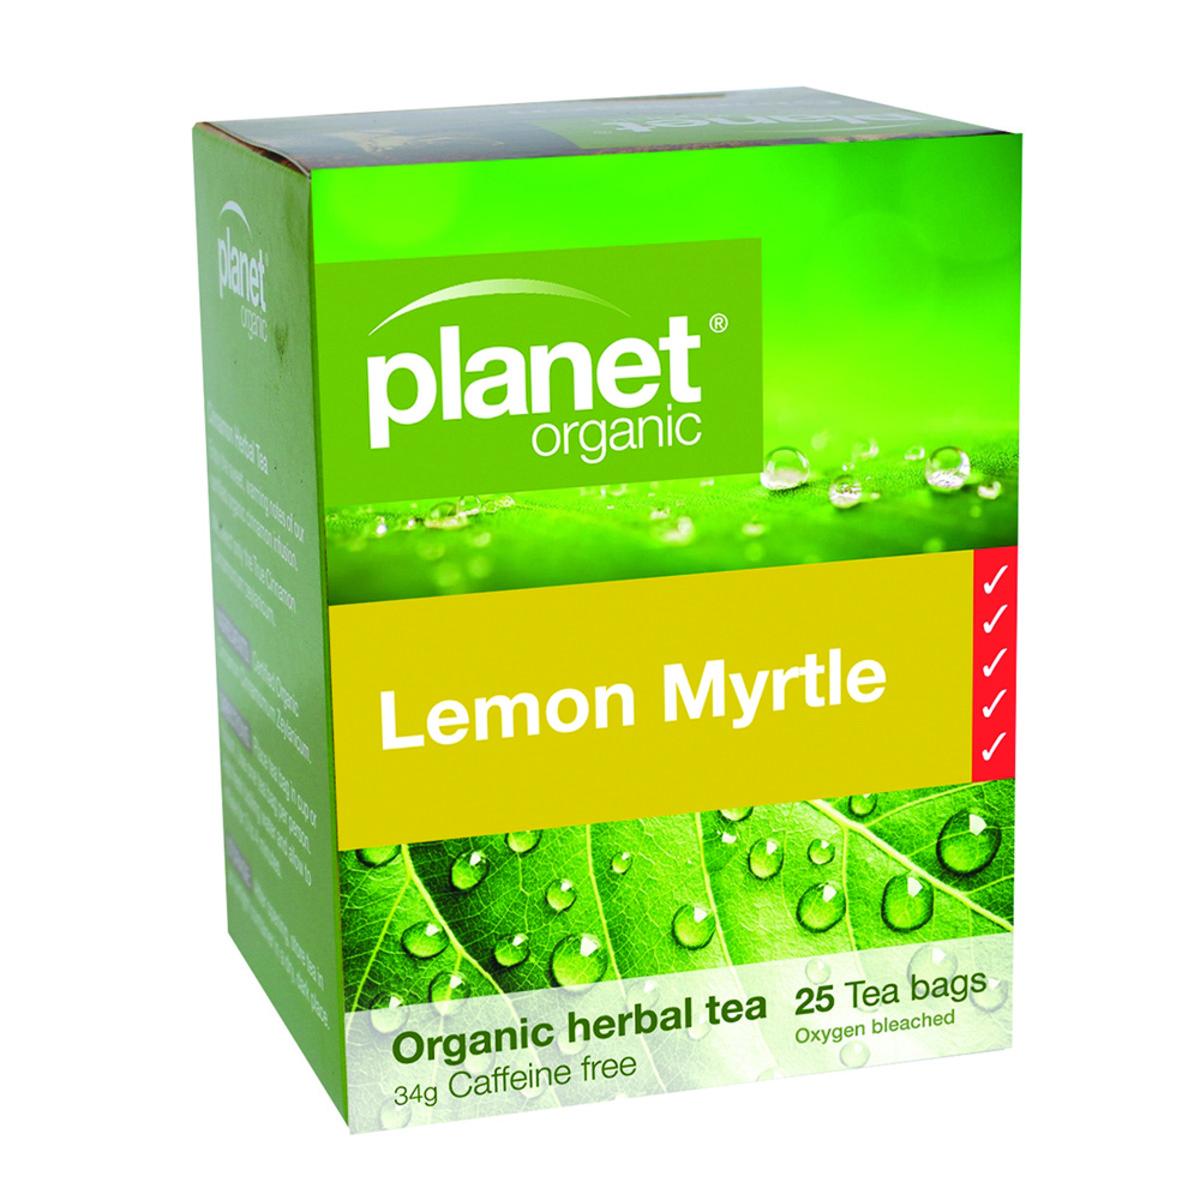 PLANET ORGANIC LEMON MYRTLE TEA 25TB